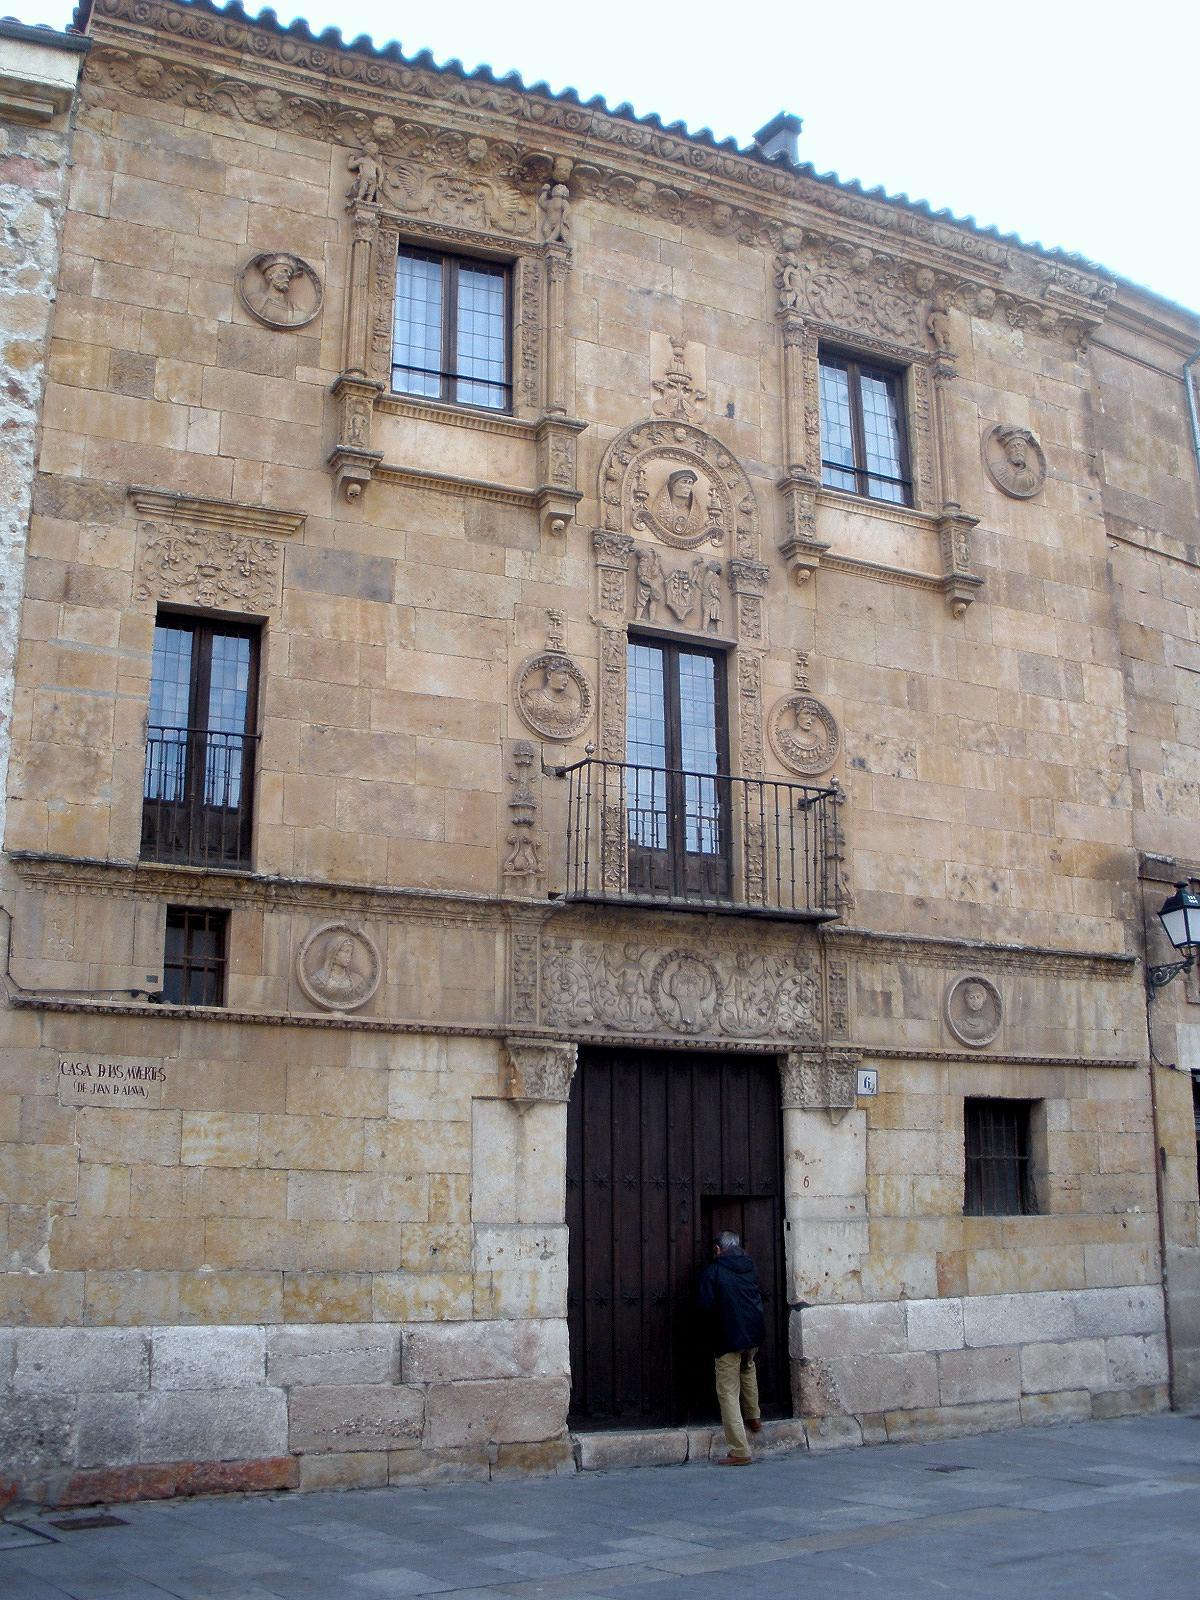 File:Salamanca - Casa de las Muertes 1.jpg